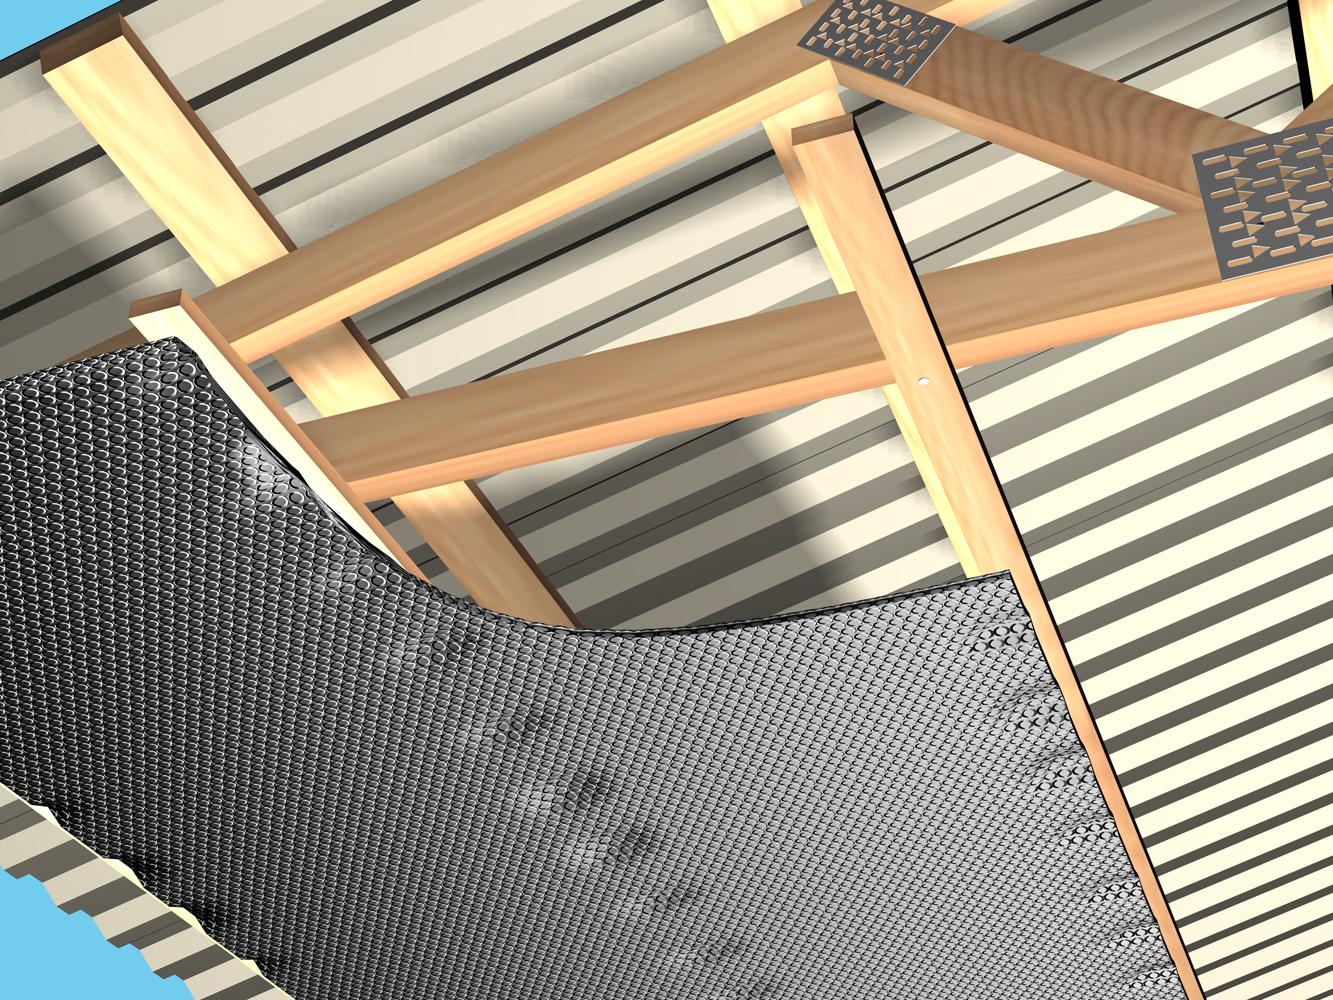 Folie termoizolanta utlilizare - Hale industriale REFLECTIX - Poza 5